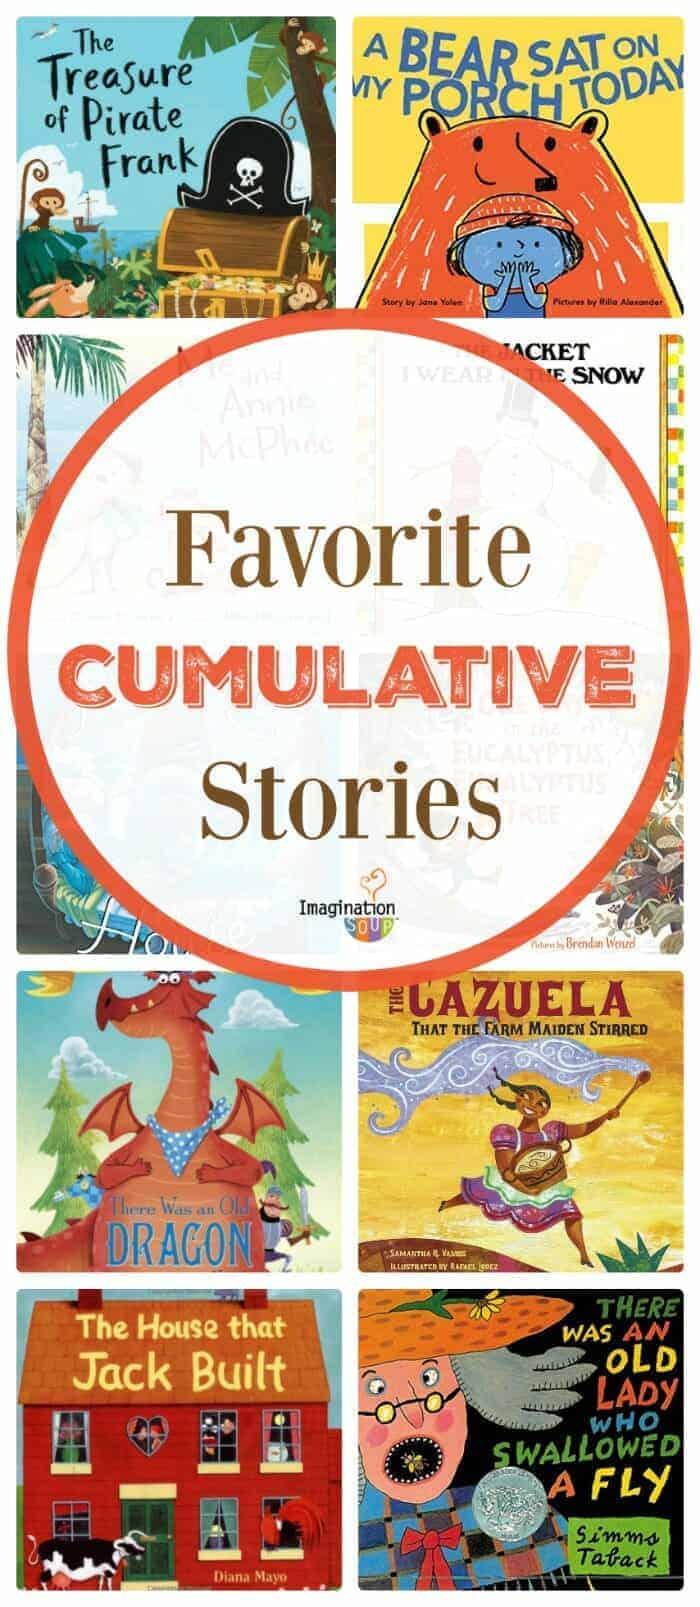 10 Favorite CumulativeStories for Kids